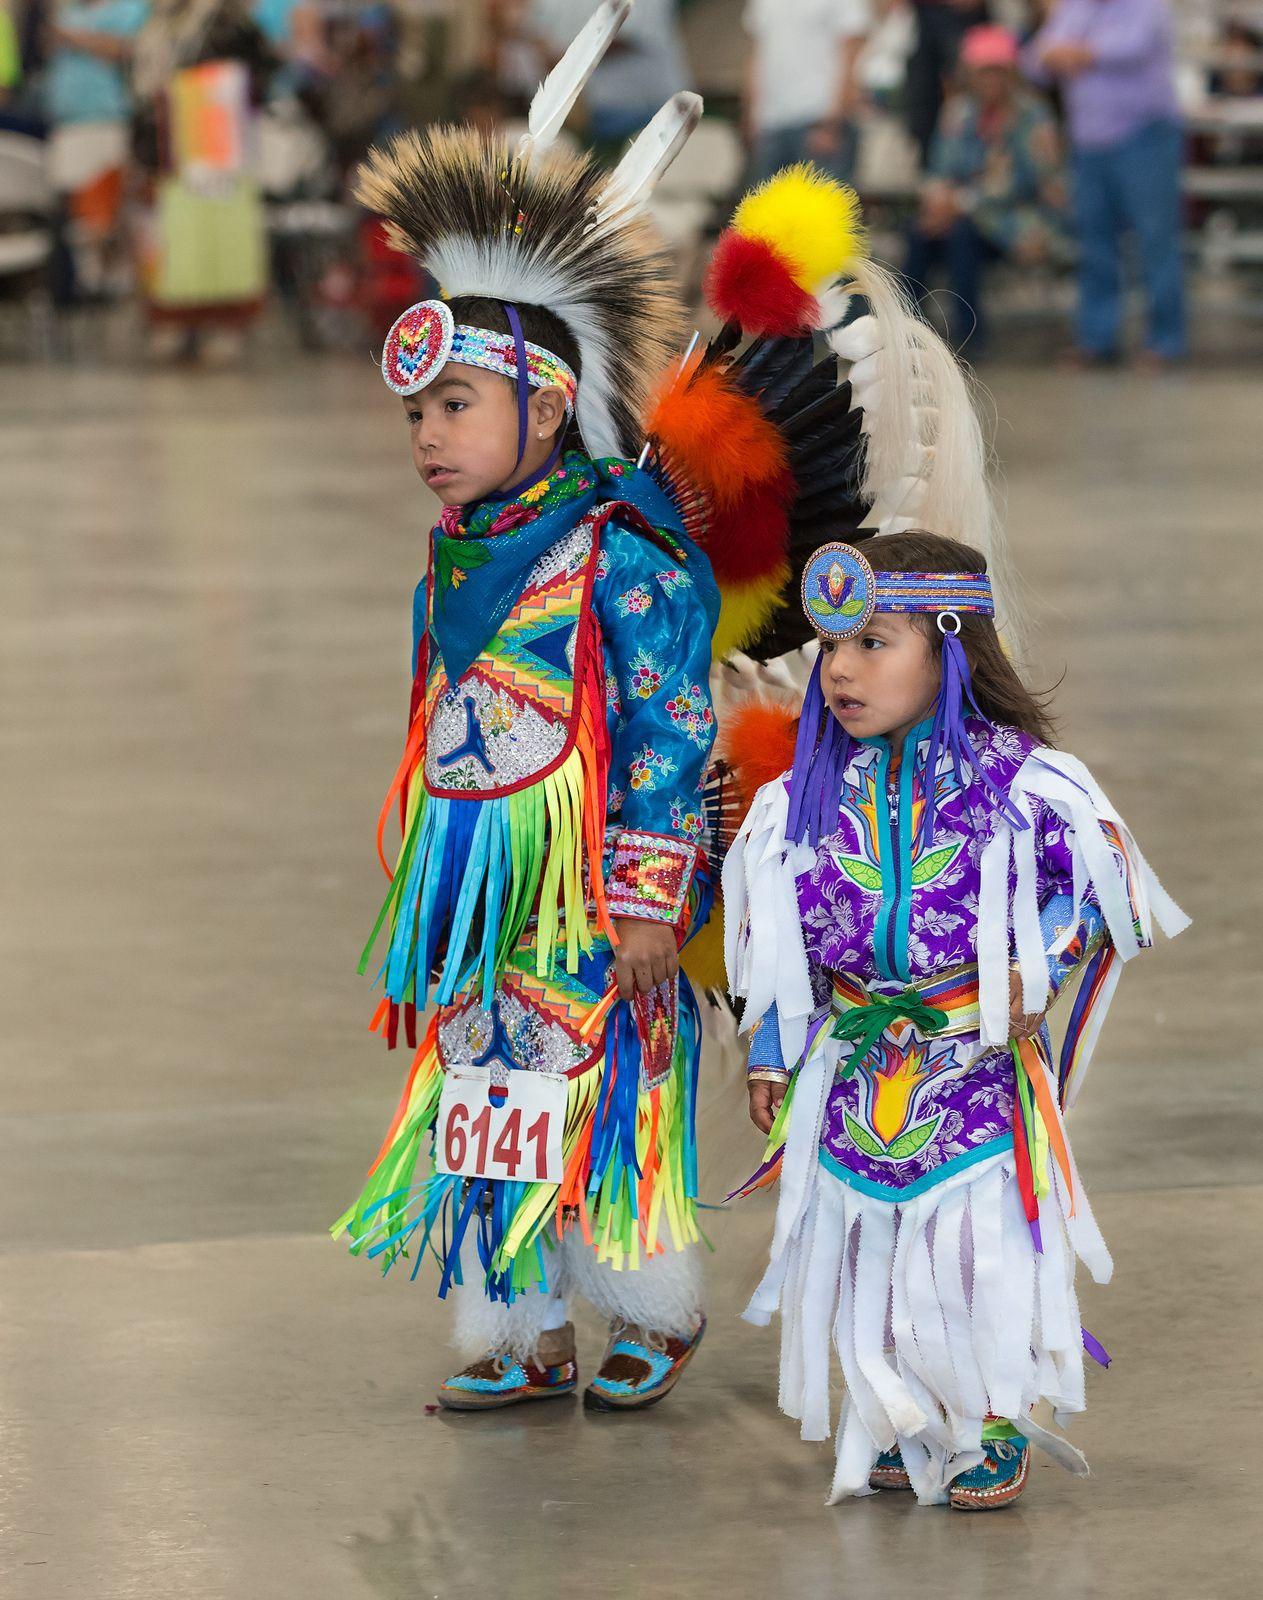 Helena Pow Wow 2012 Regalia & Clothing Native american